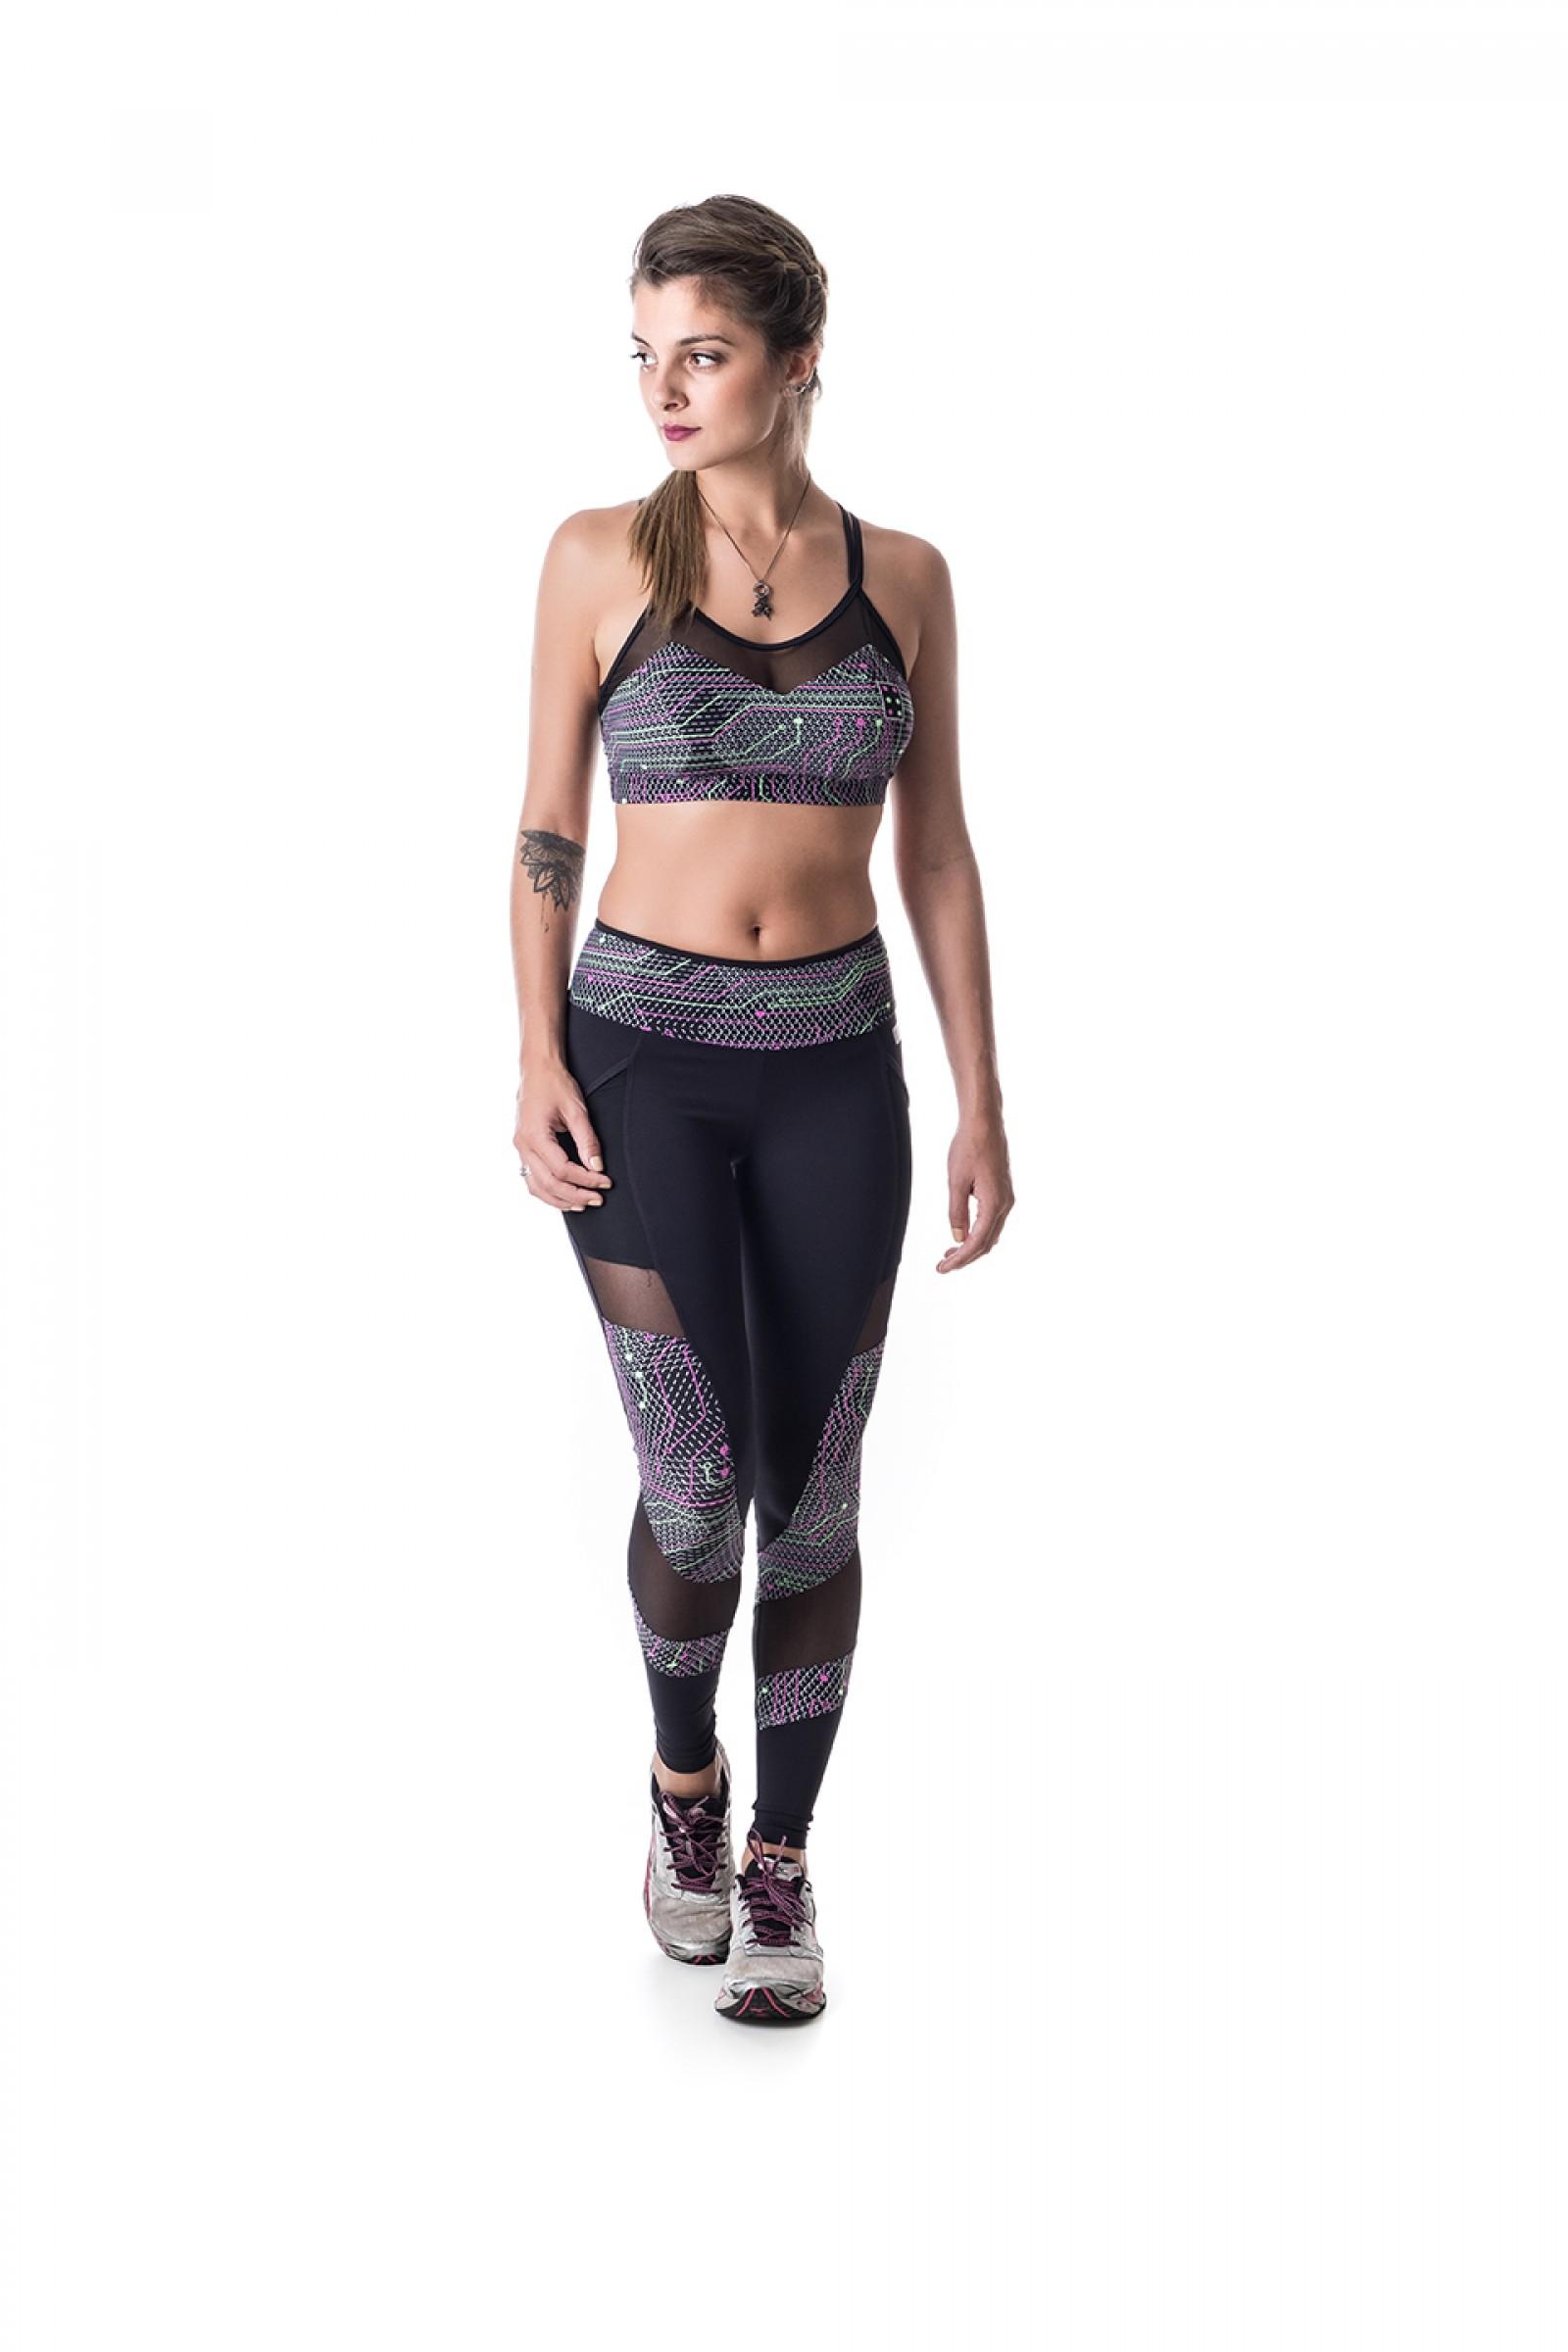 Legging Best Reflet, Coleção Challenge - NKT Fitwear Moda Fitness